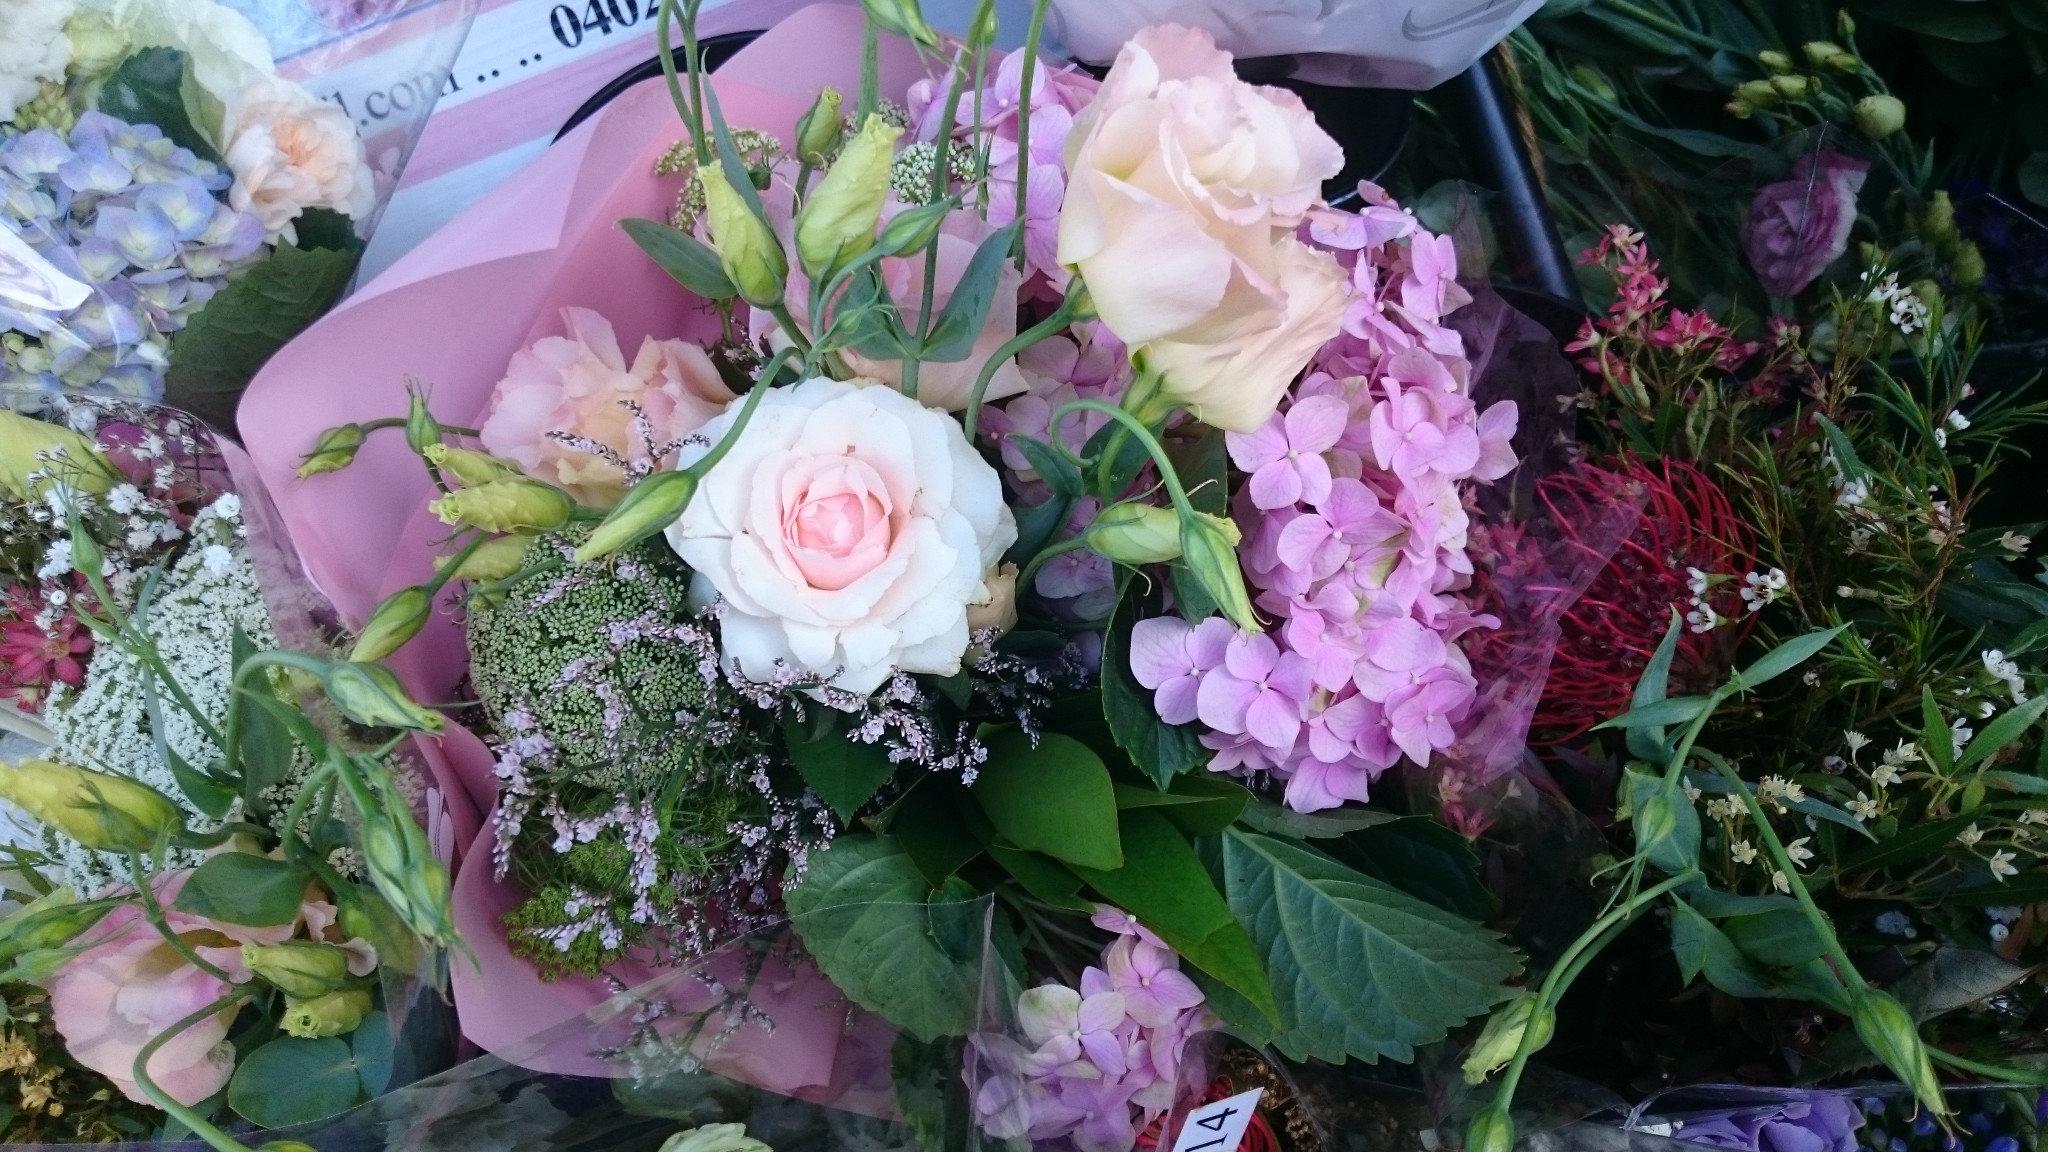 Gift Bouquet/Flower Bunch: Budget friendly